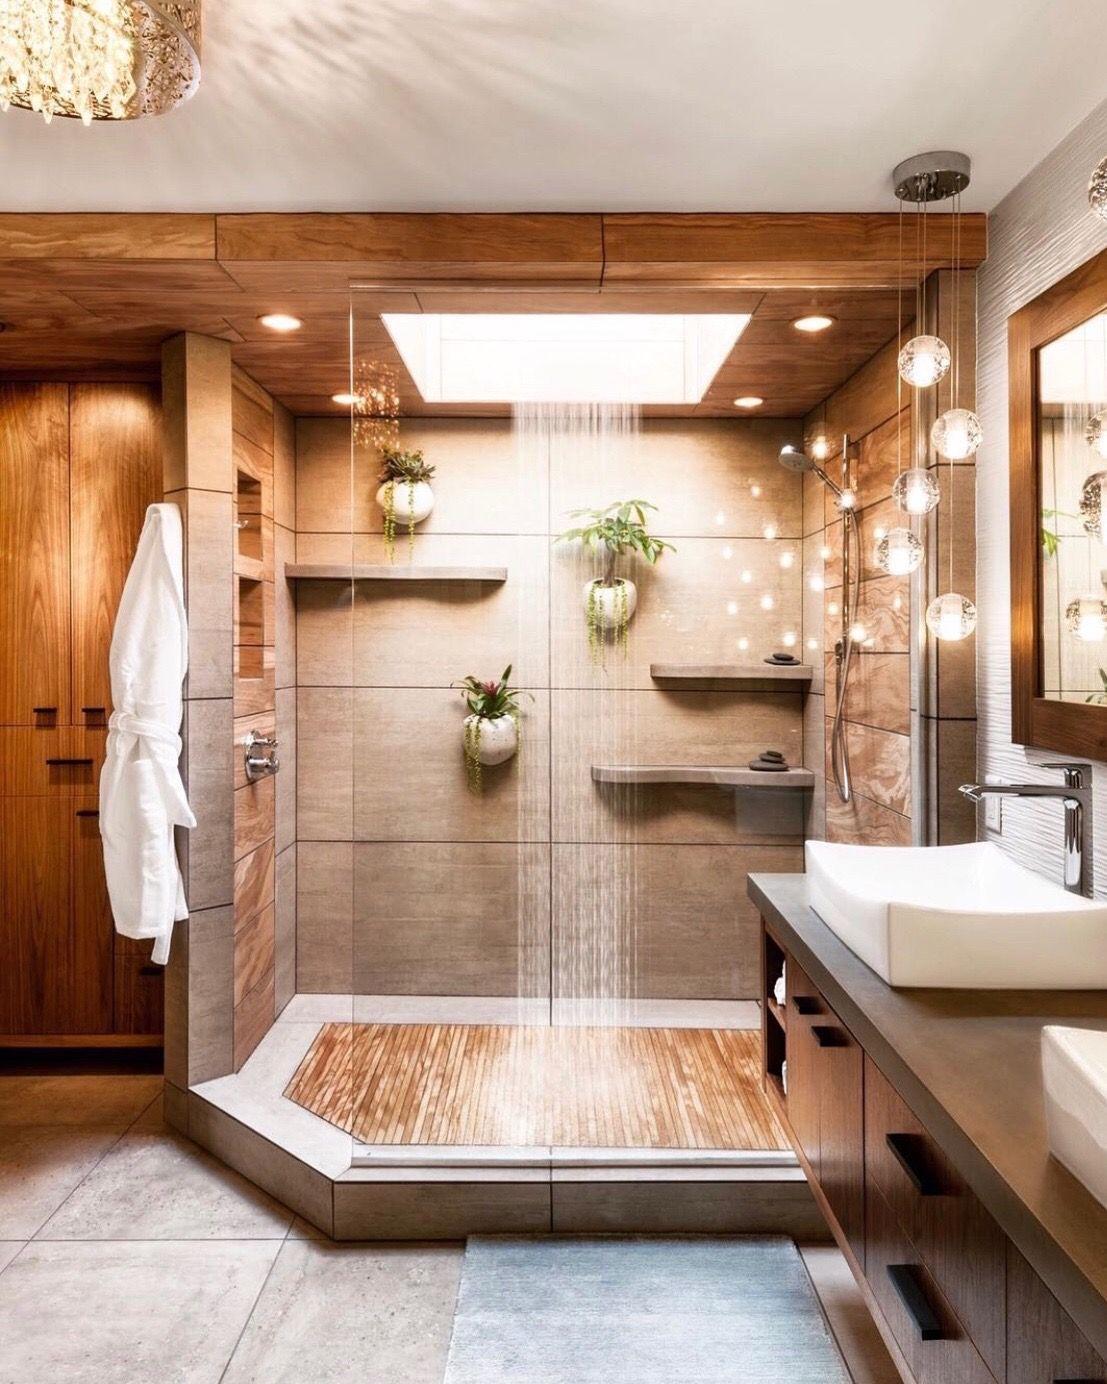 Simple Bathroom Remodel Small Bathroom Remodel Cheap Bathroom Remodel Small home bathroom design ideas